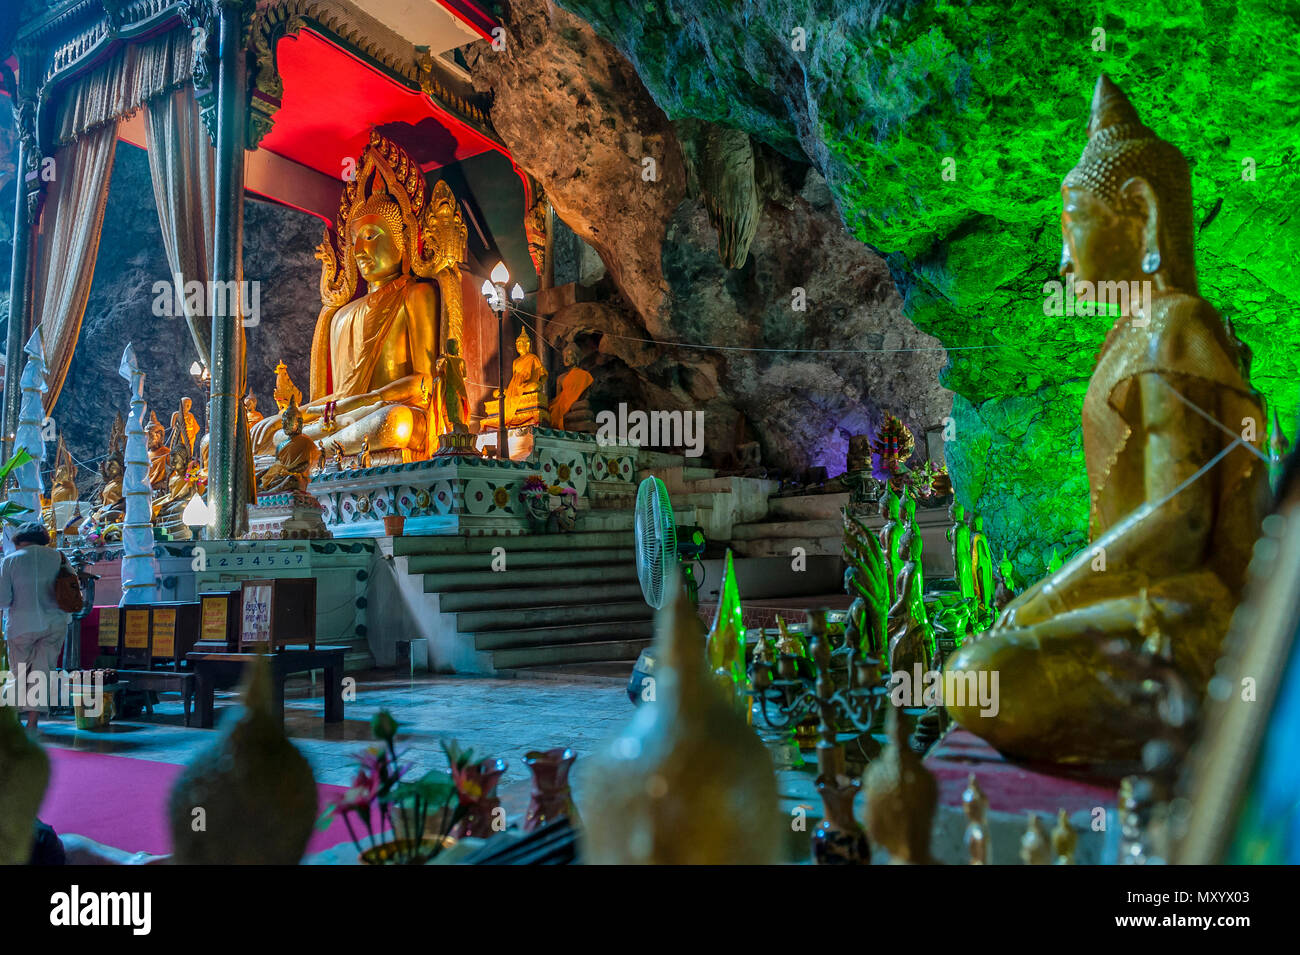 Wat Ban Tham Höhlentempel. Khao Noi, Tha Muang Viertel, 75060Kanchanaburi, Thailand Stockbild